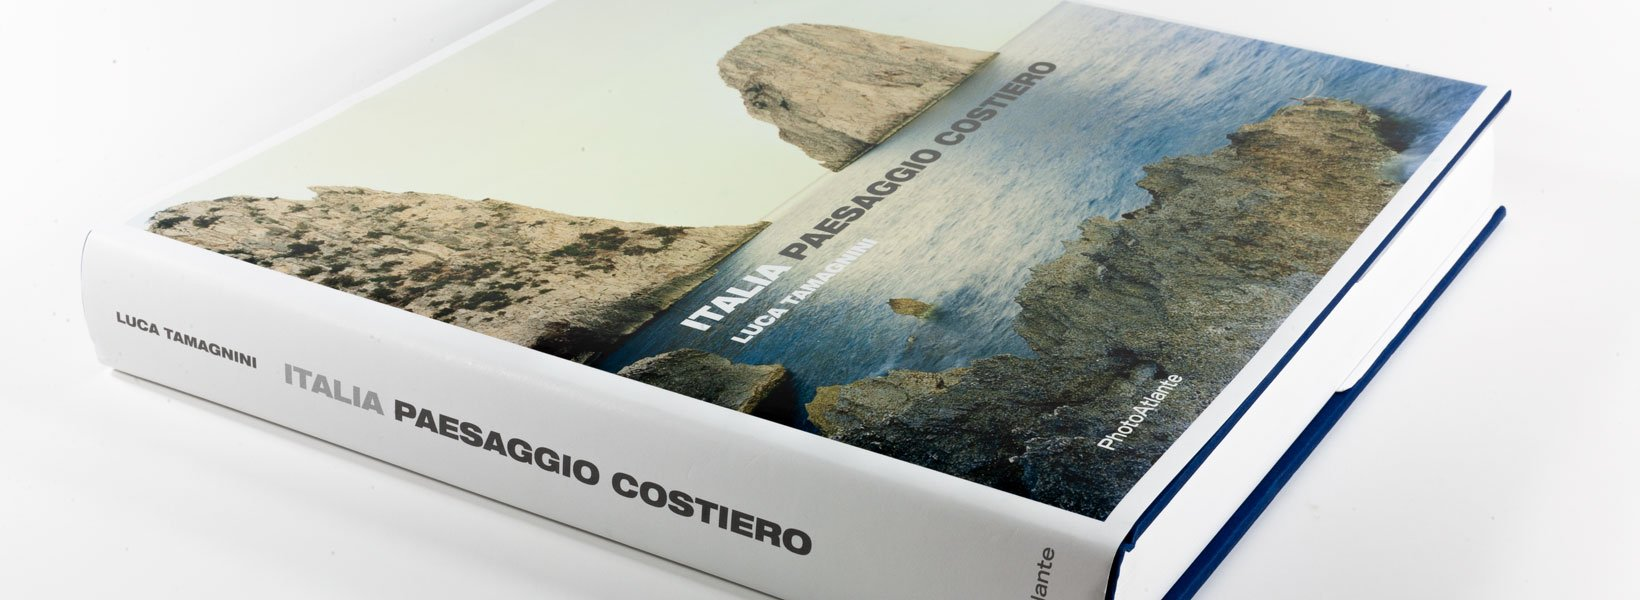 Photoatlante libro Italia Paesaggio Costiero Luca Tamagnini